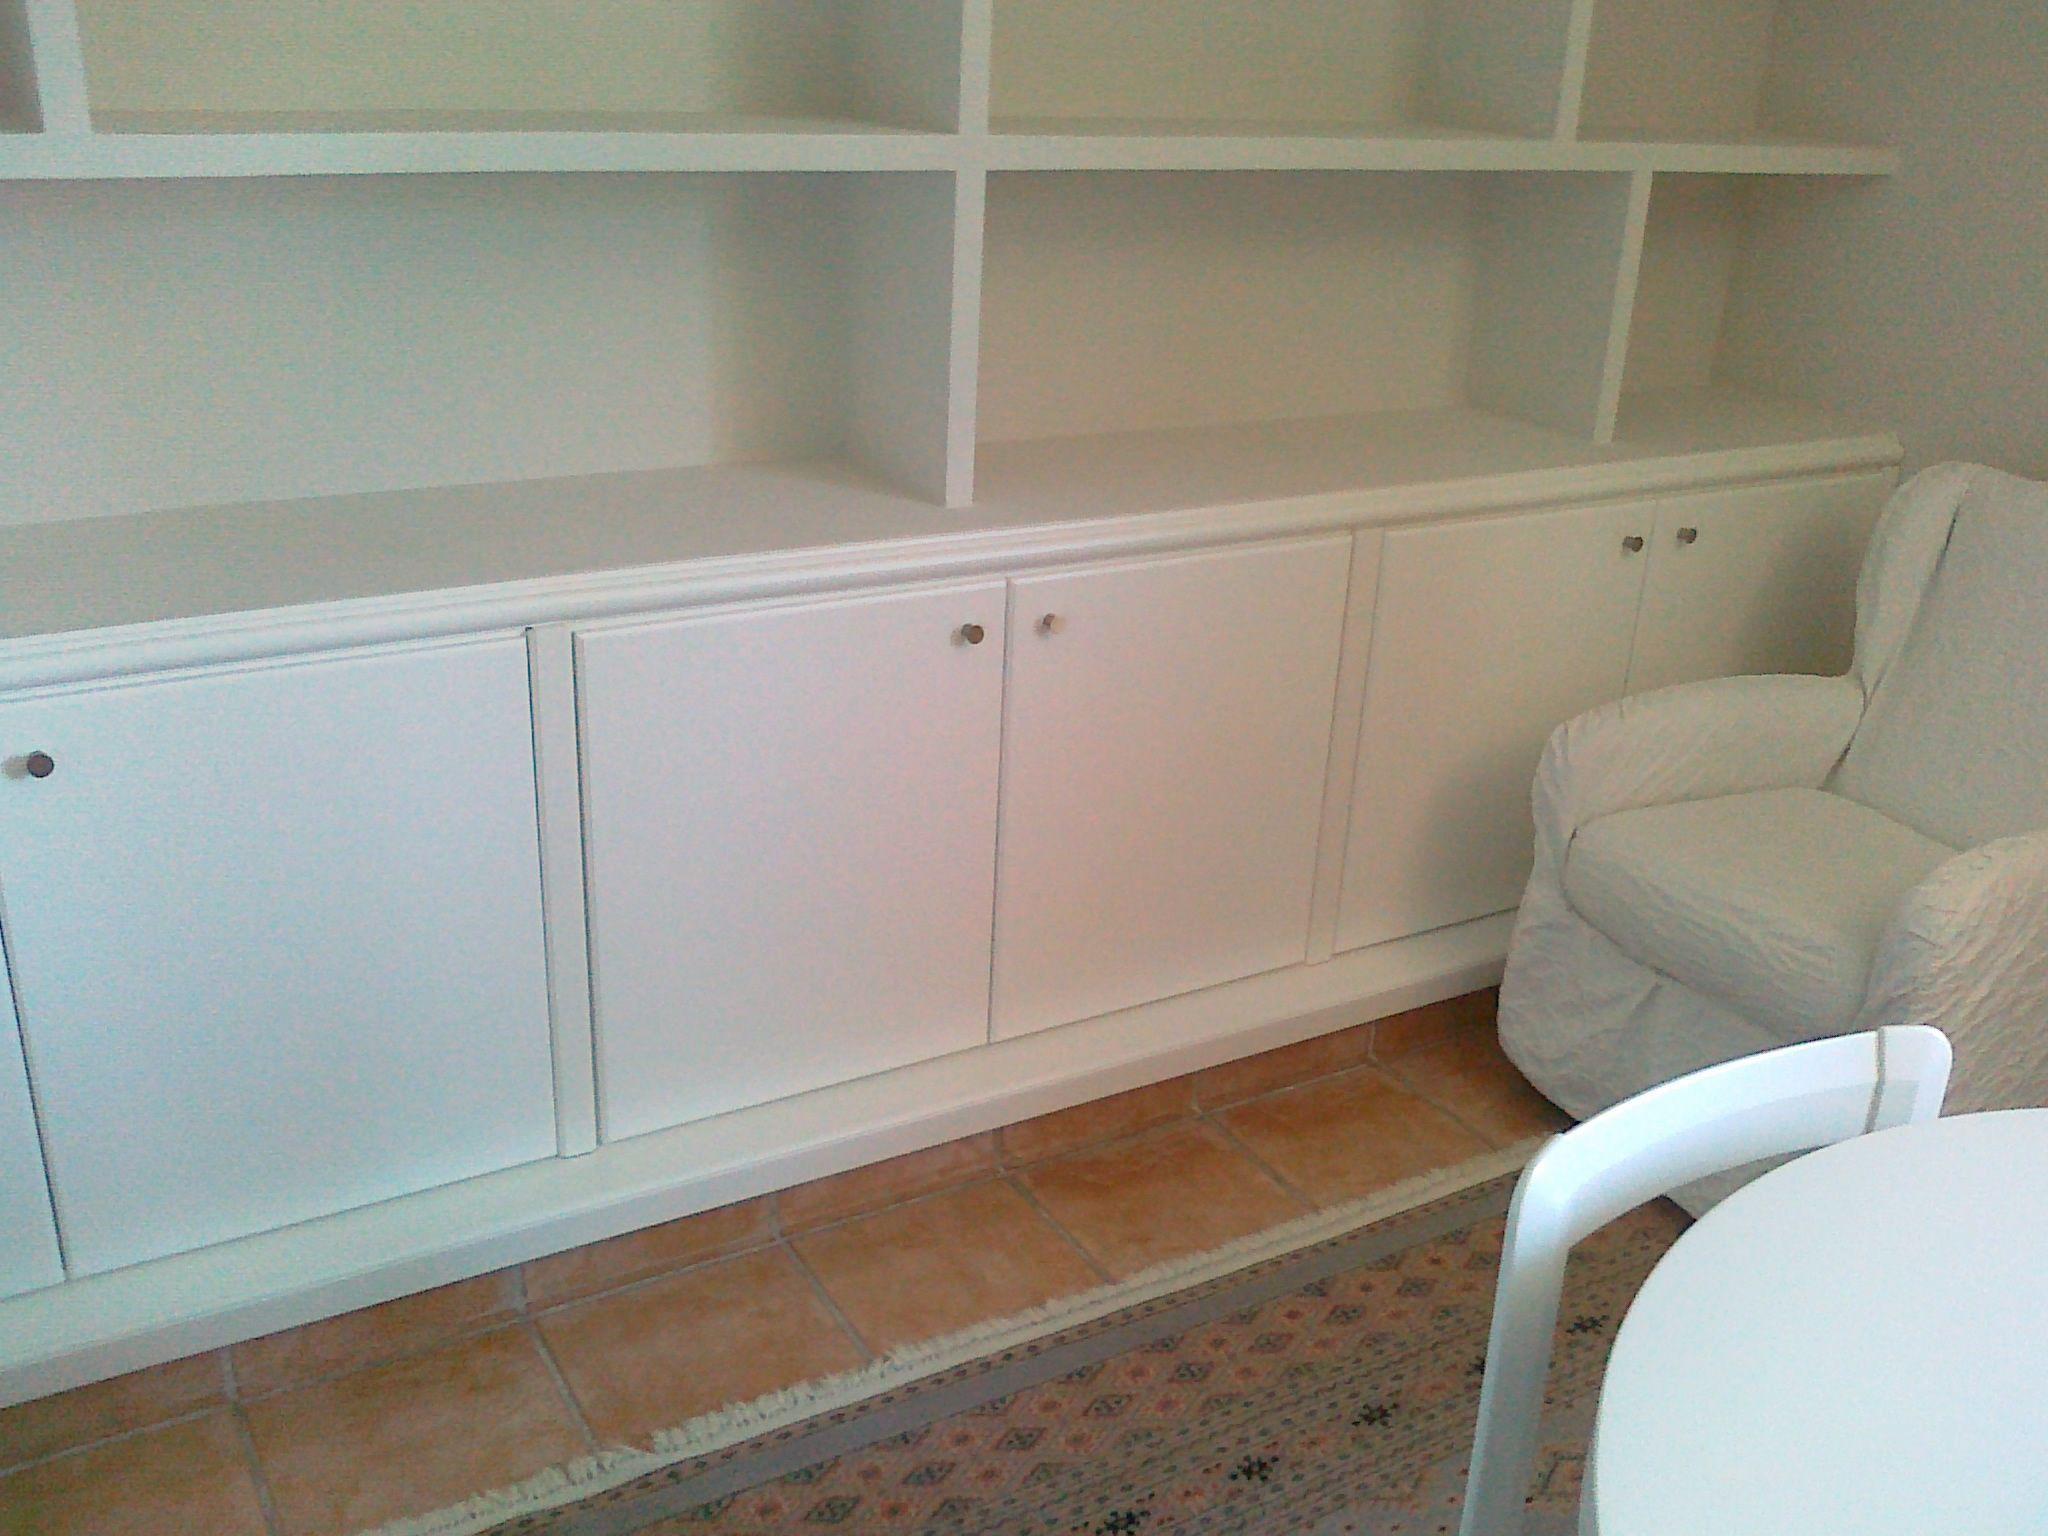 Restaurar mueble antiguo como restaurar muebles for Renovar muebles antiguos